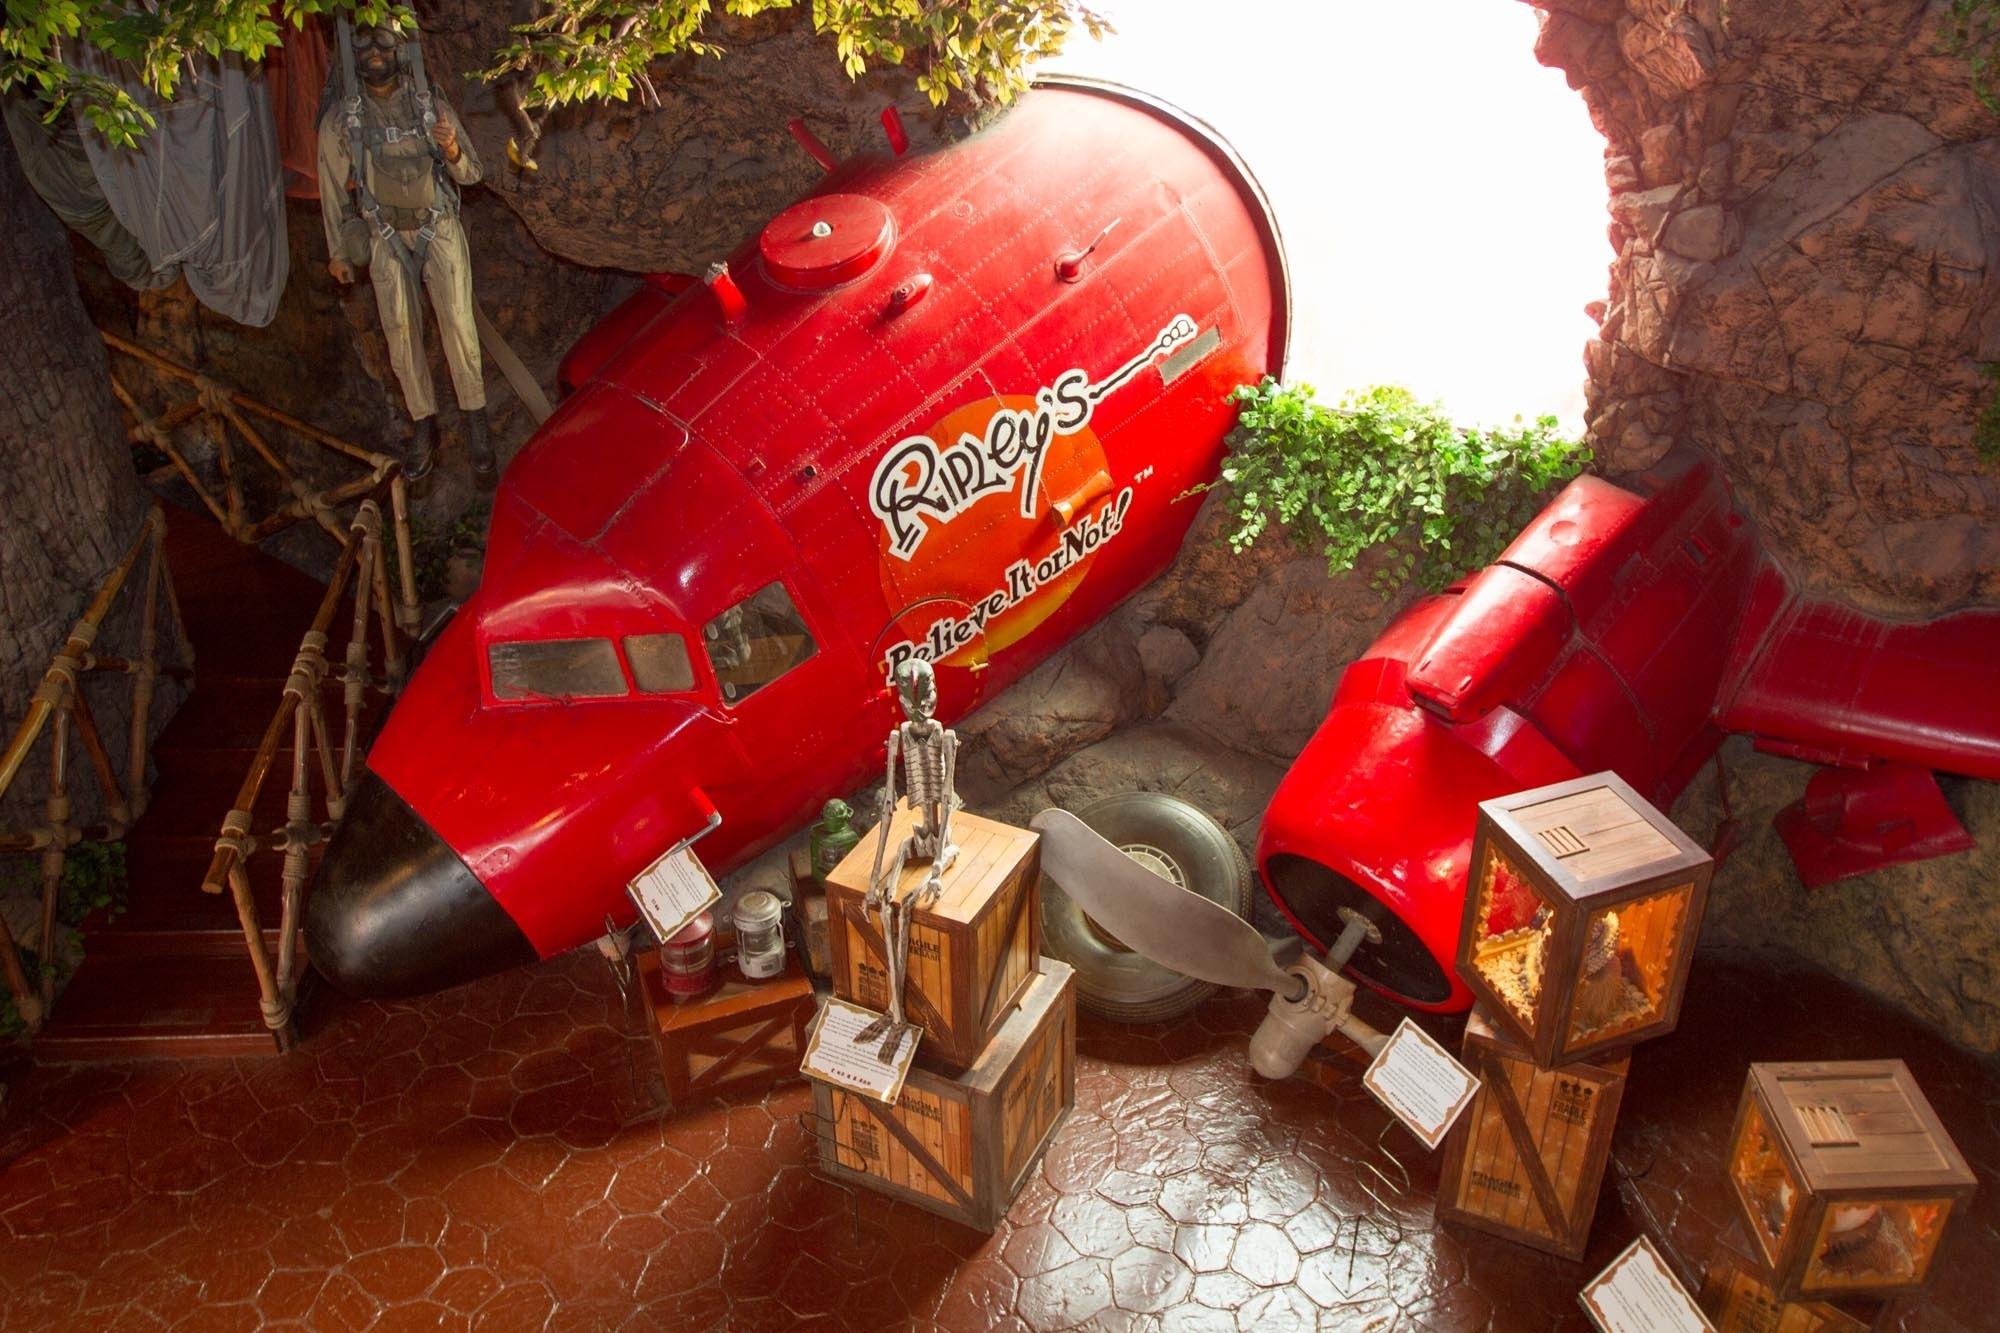 Музей-аттракцион Рипли «хотите верьте, хотите нет»